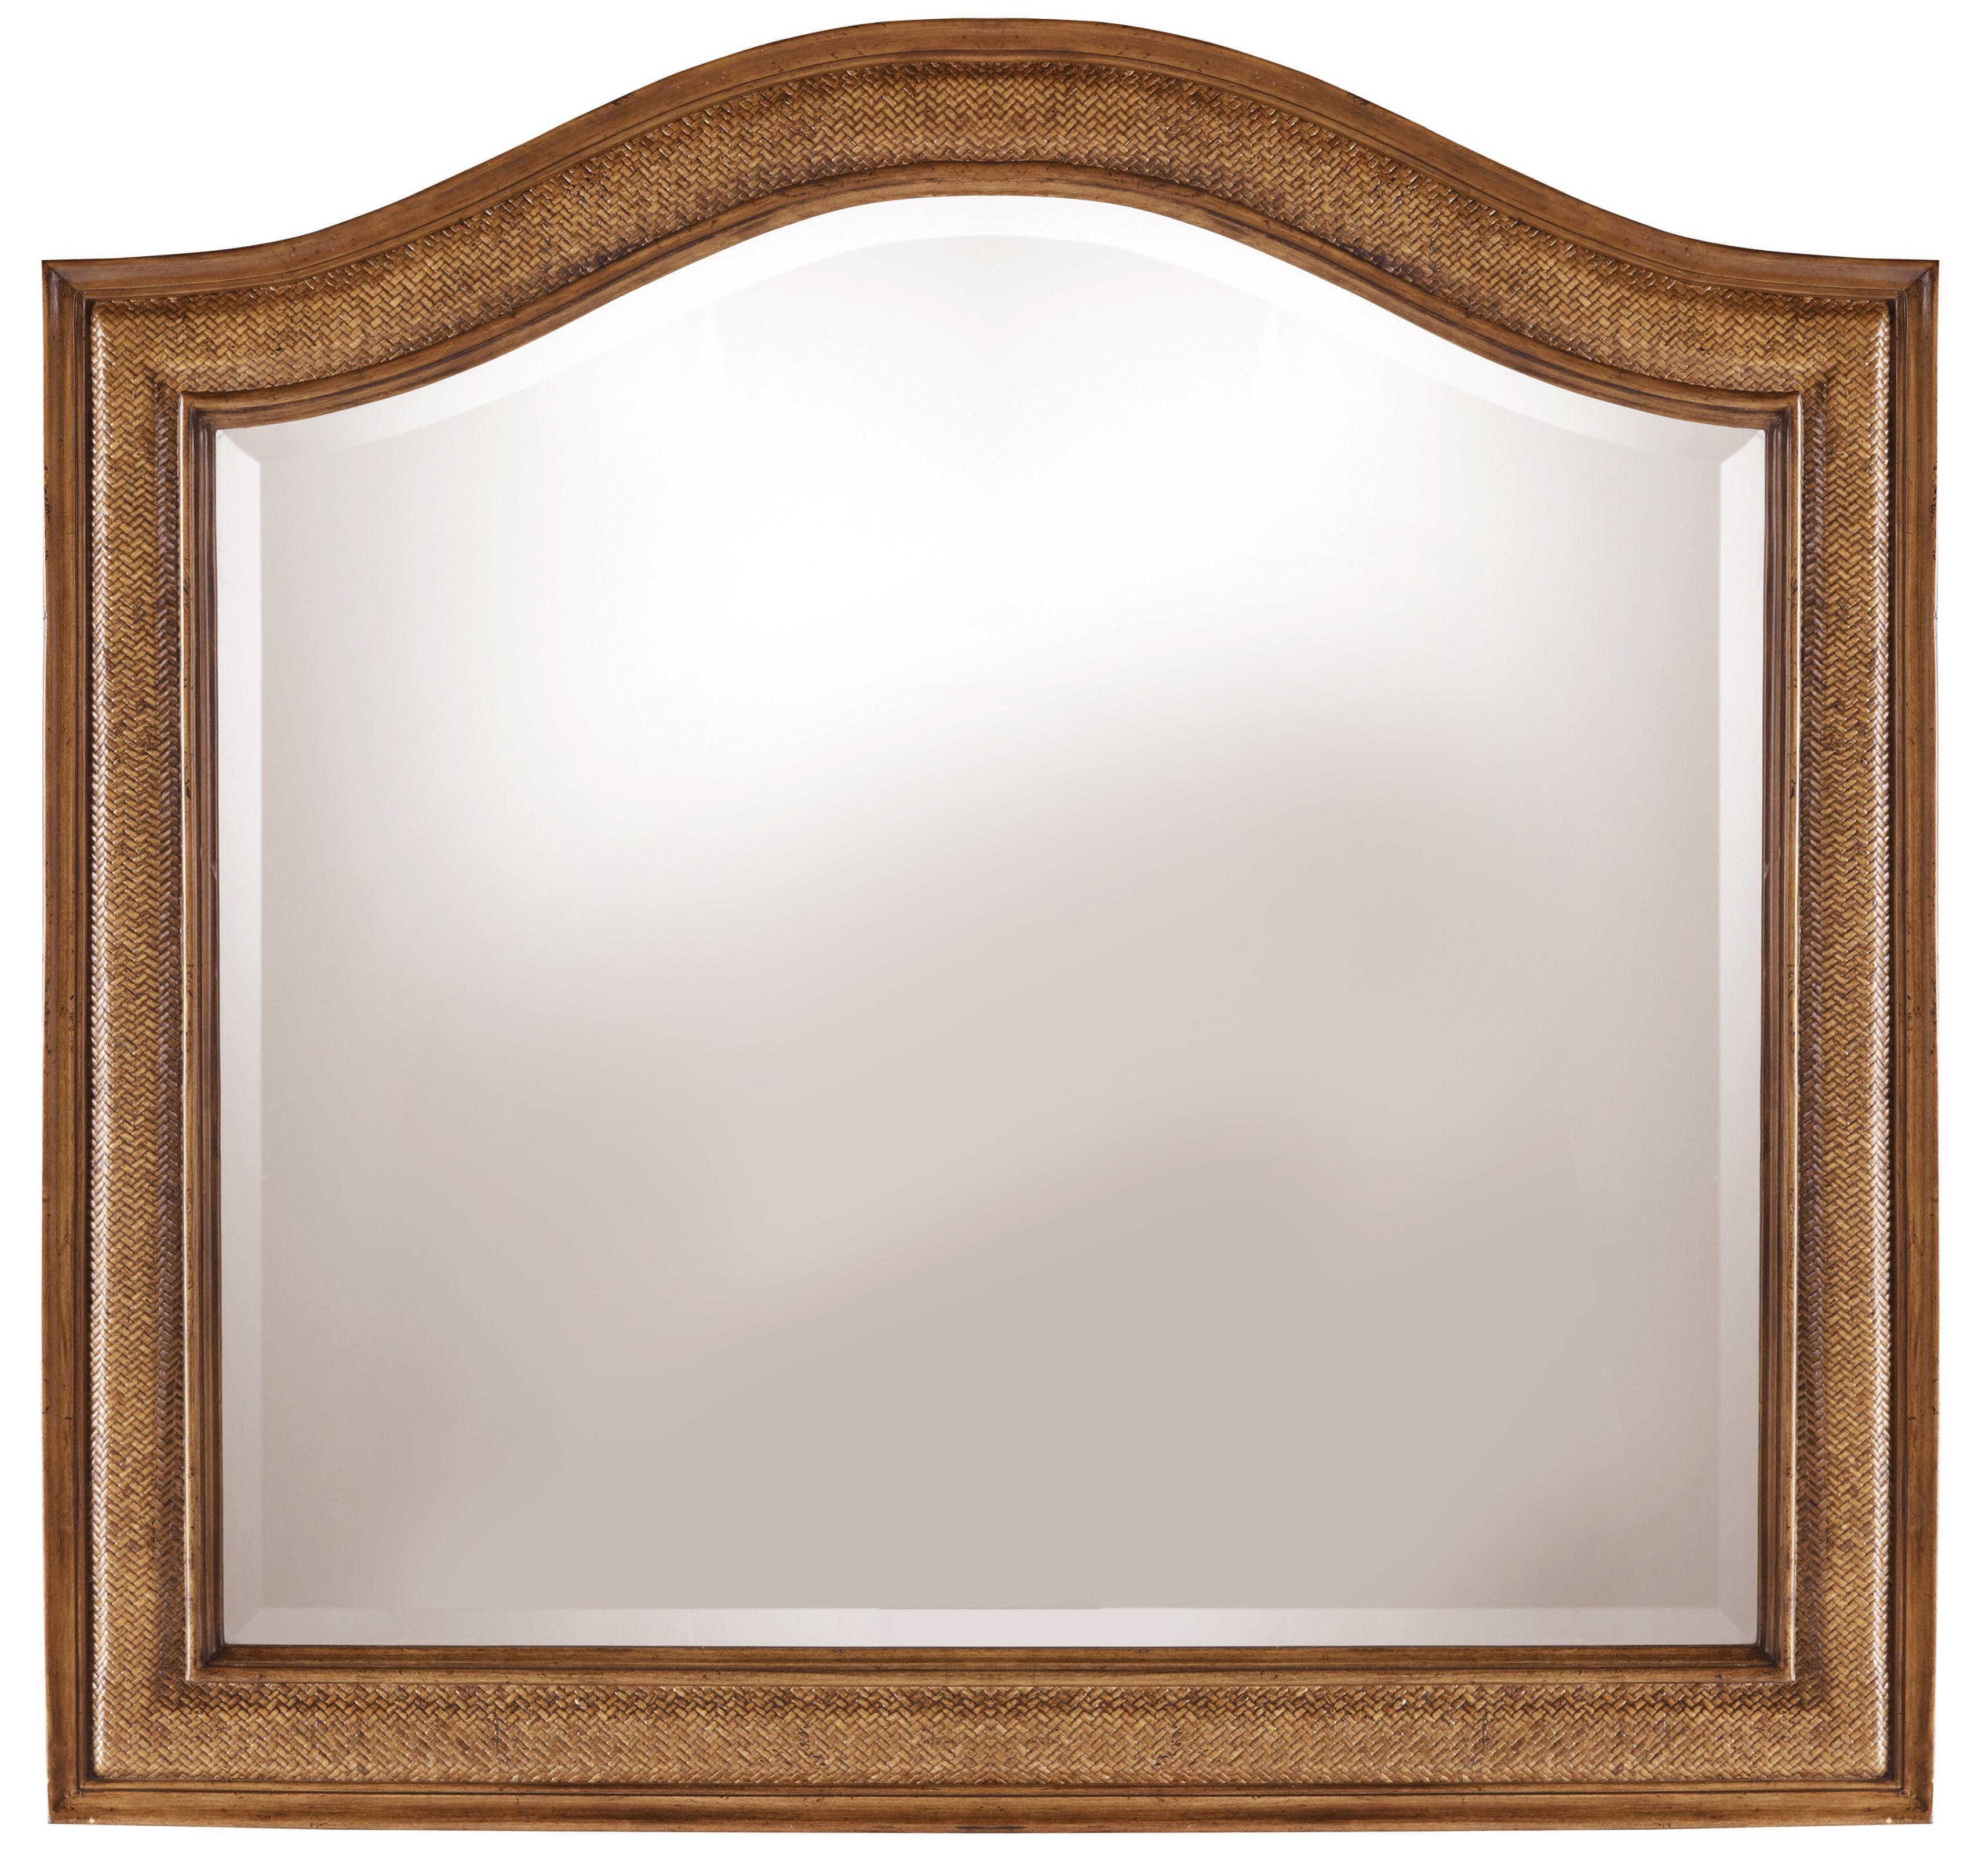 Hooker Furniture Windward Wall Mirror - Item Number: 1125-91009